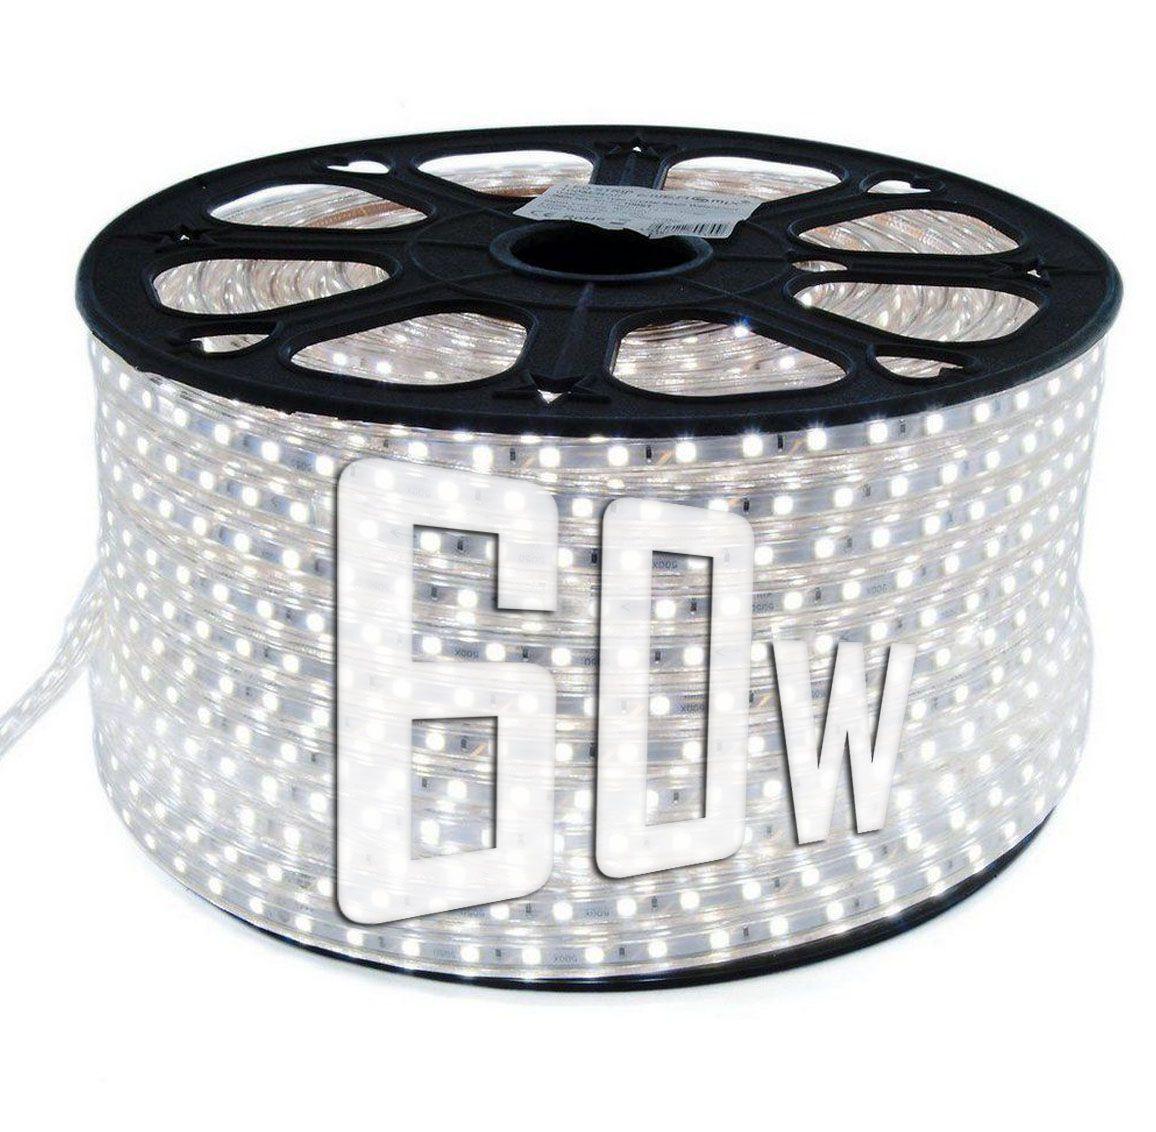 Mangueira Chata 60w / Bi-Volt Ultra Intensidade A prova d'água LED Branco Frio Rolo 100m